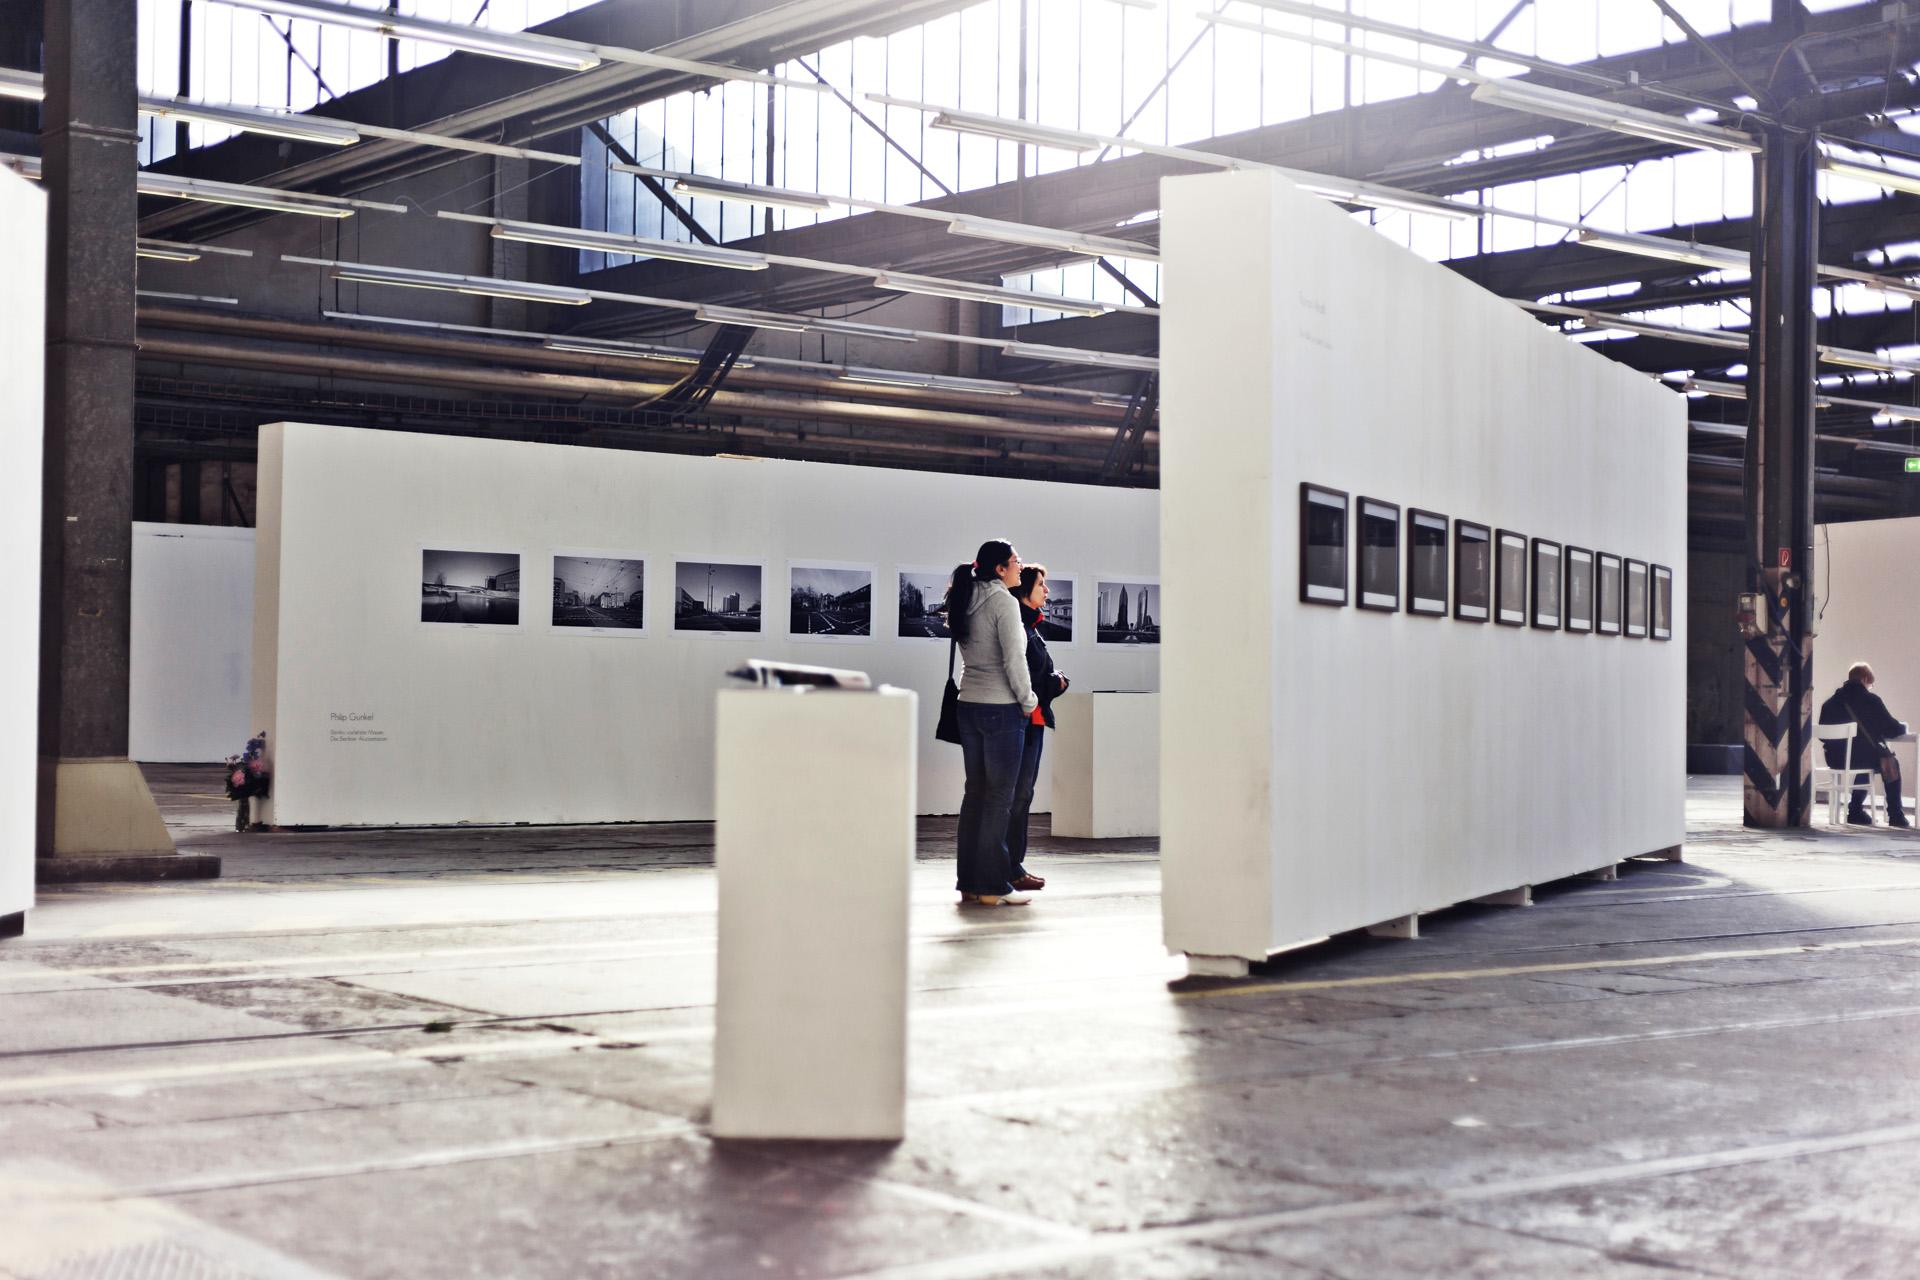 Abschlussausstellung-093